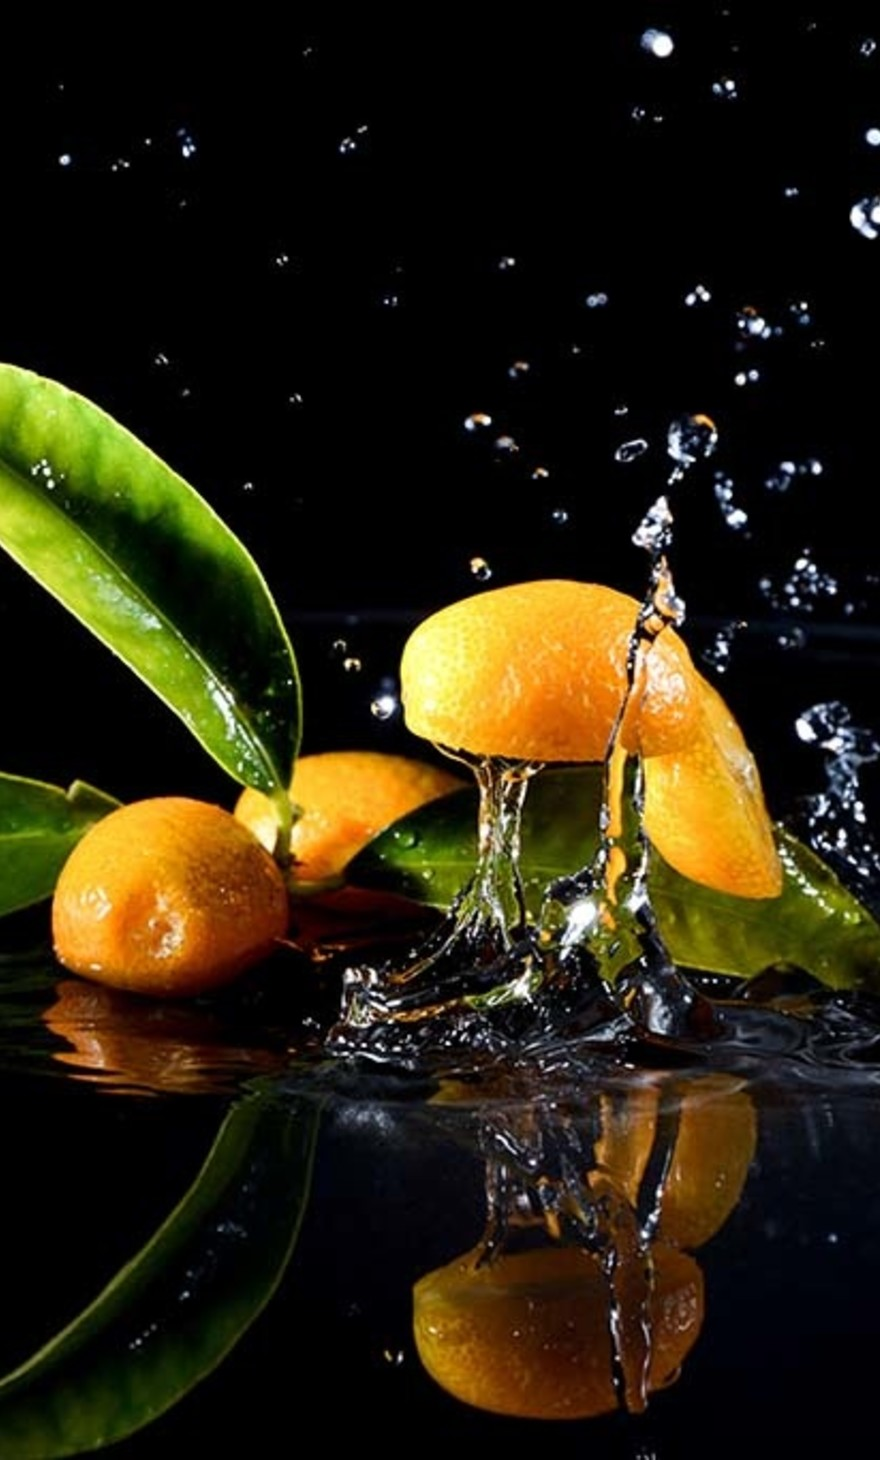 Splashing Clementines